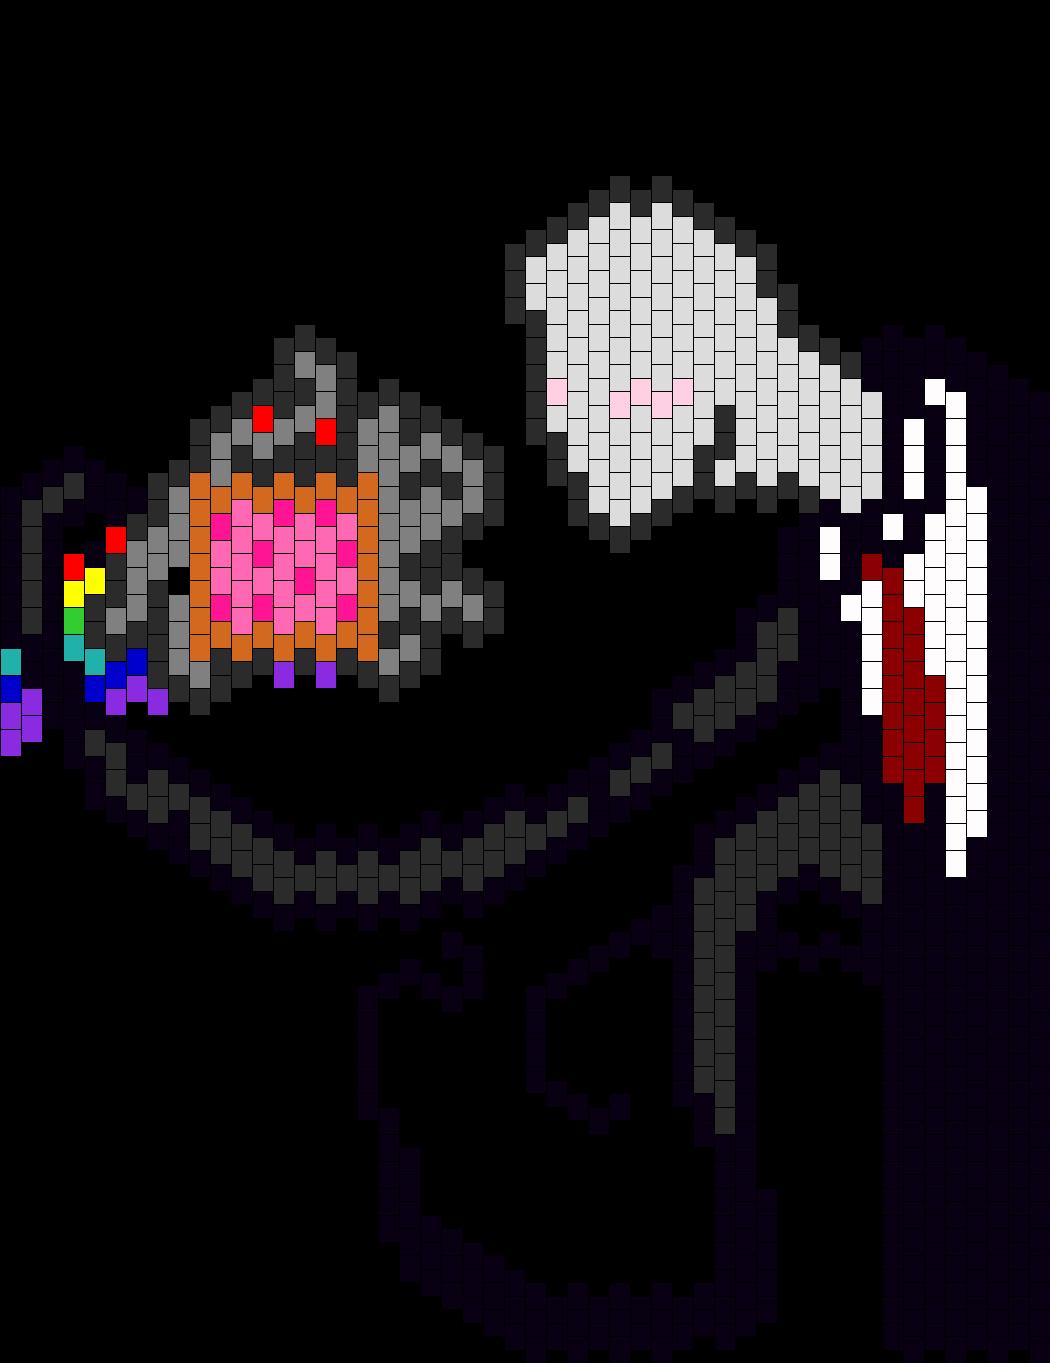 Slenderman And Nyan Cat